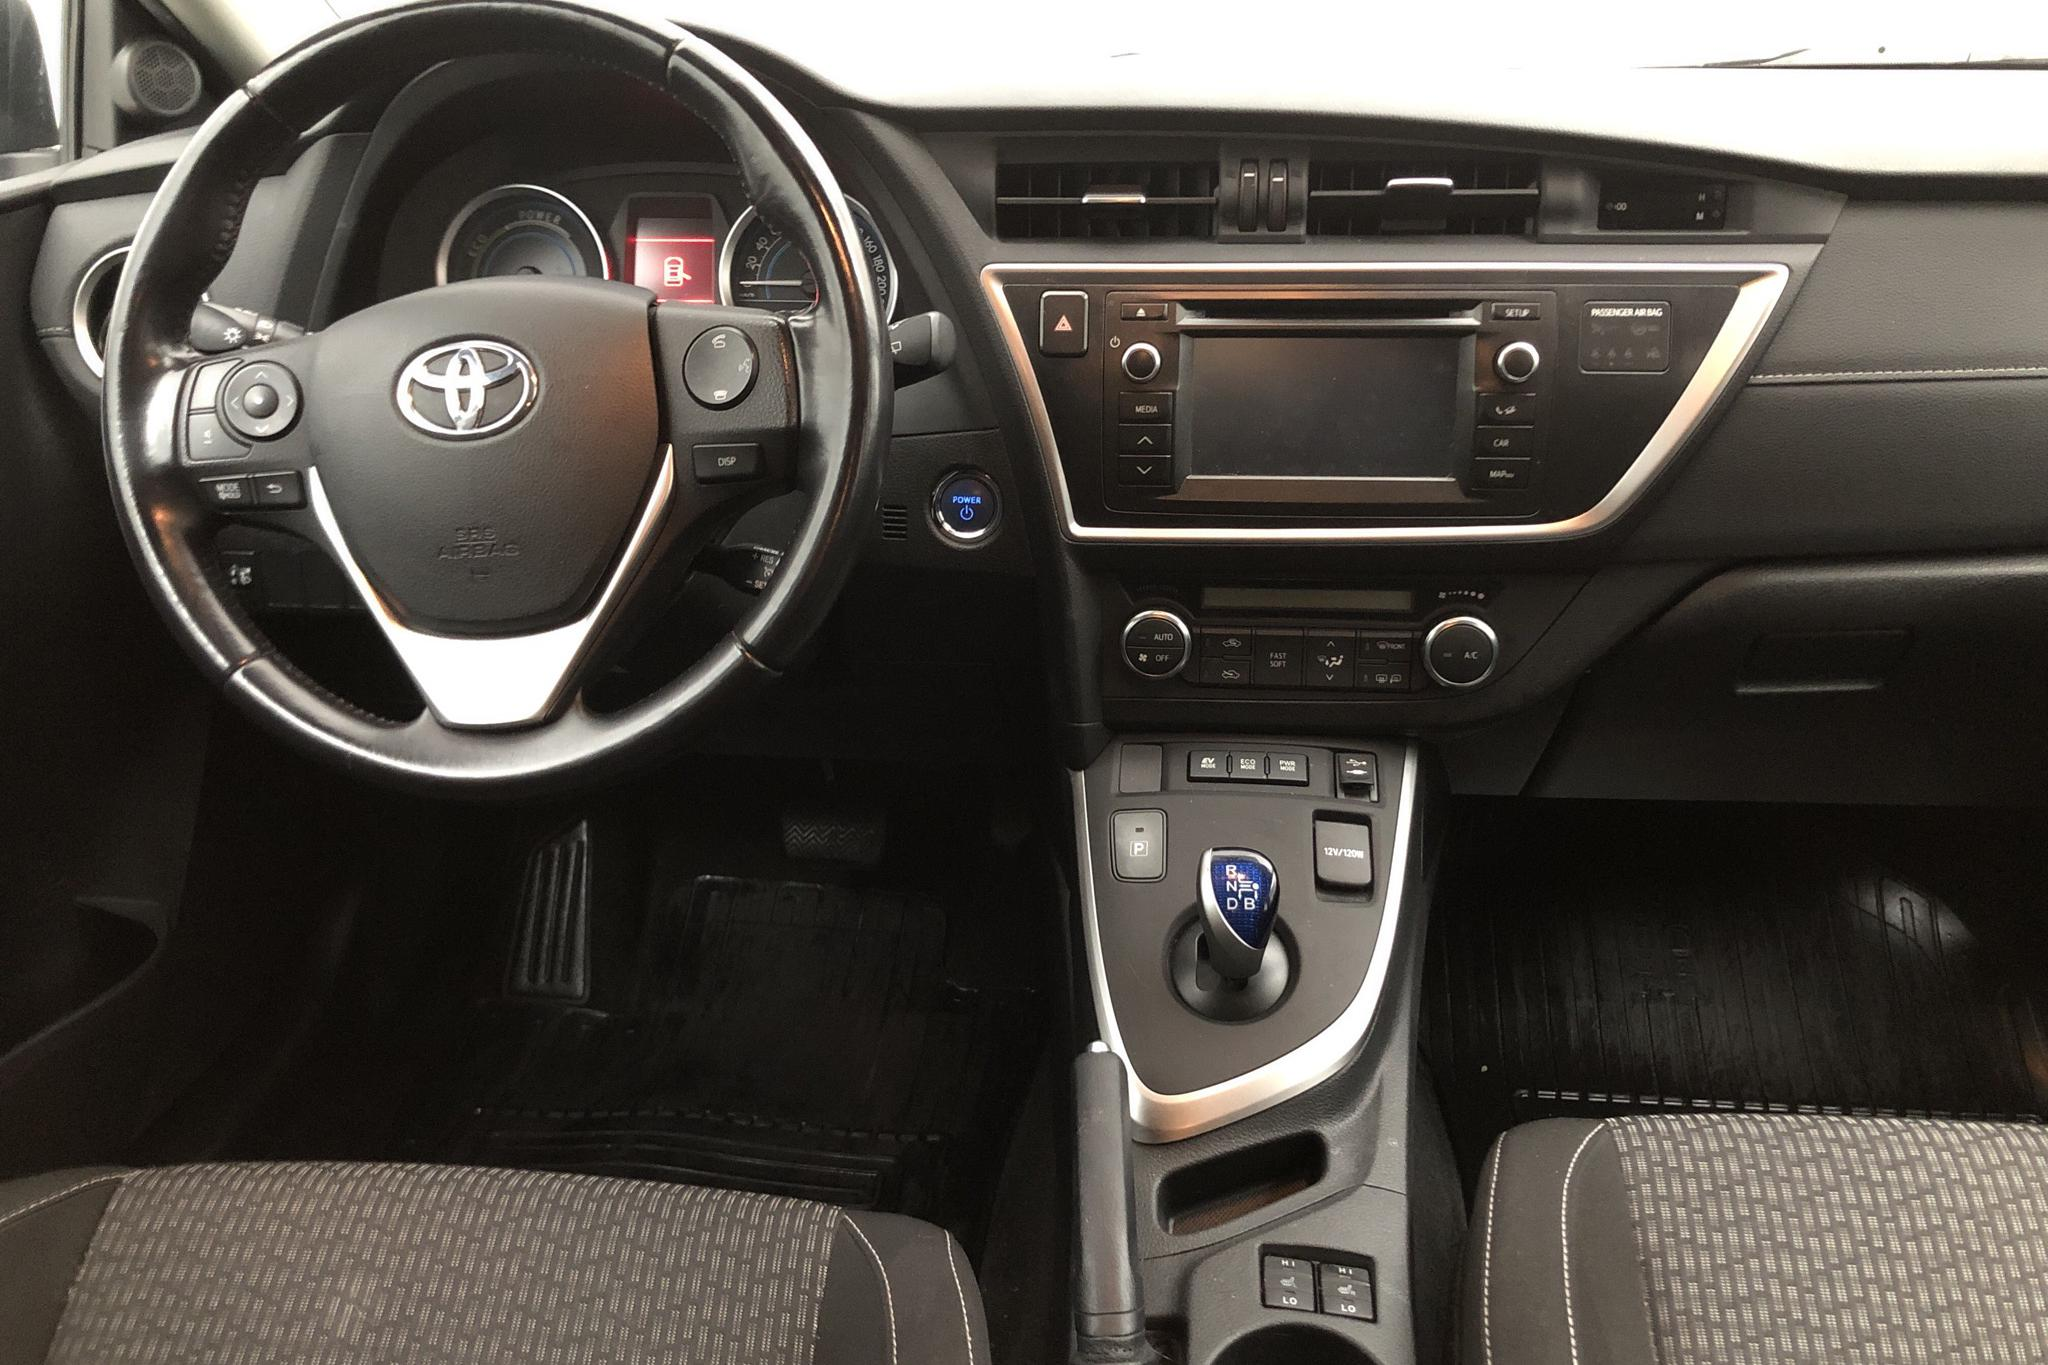 Toyota Auris 1.8 HSD Touring Sports (99hk) - 96 000 km - Automatic - brown - 2015